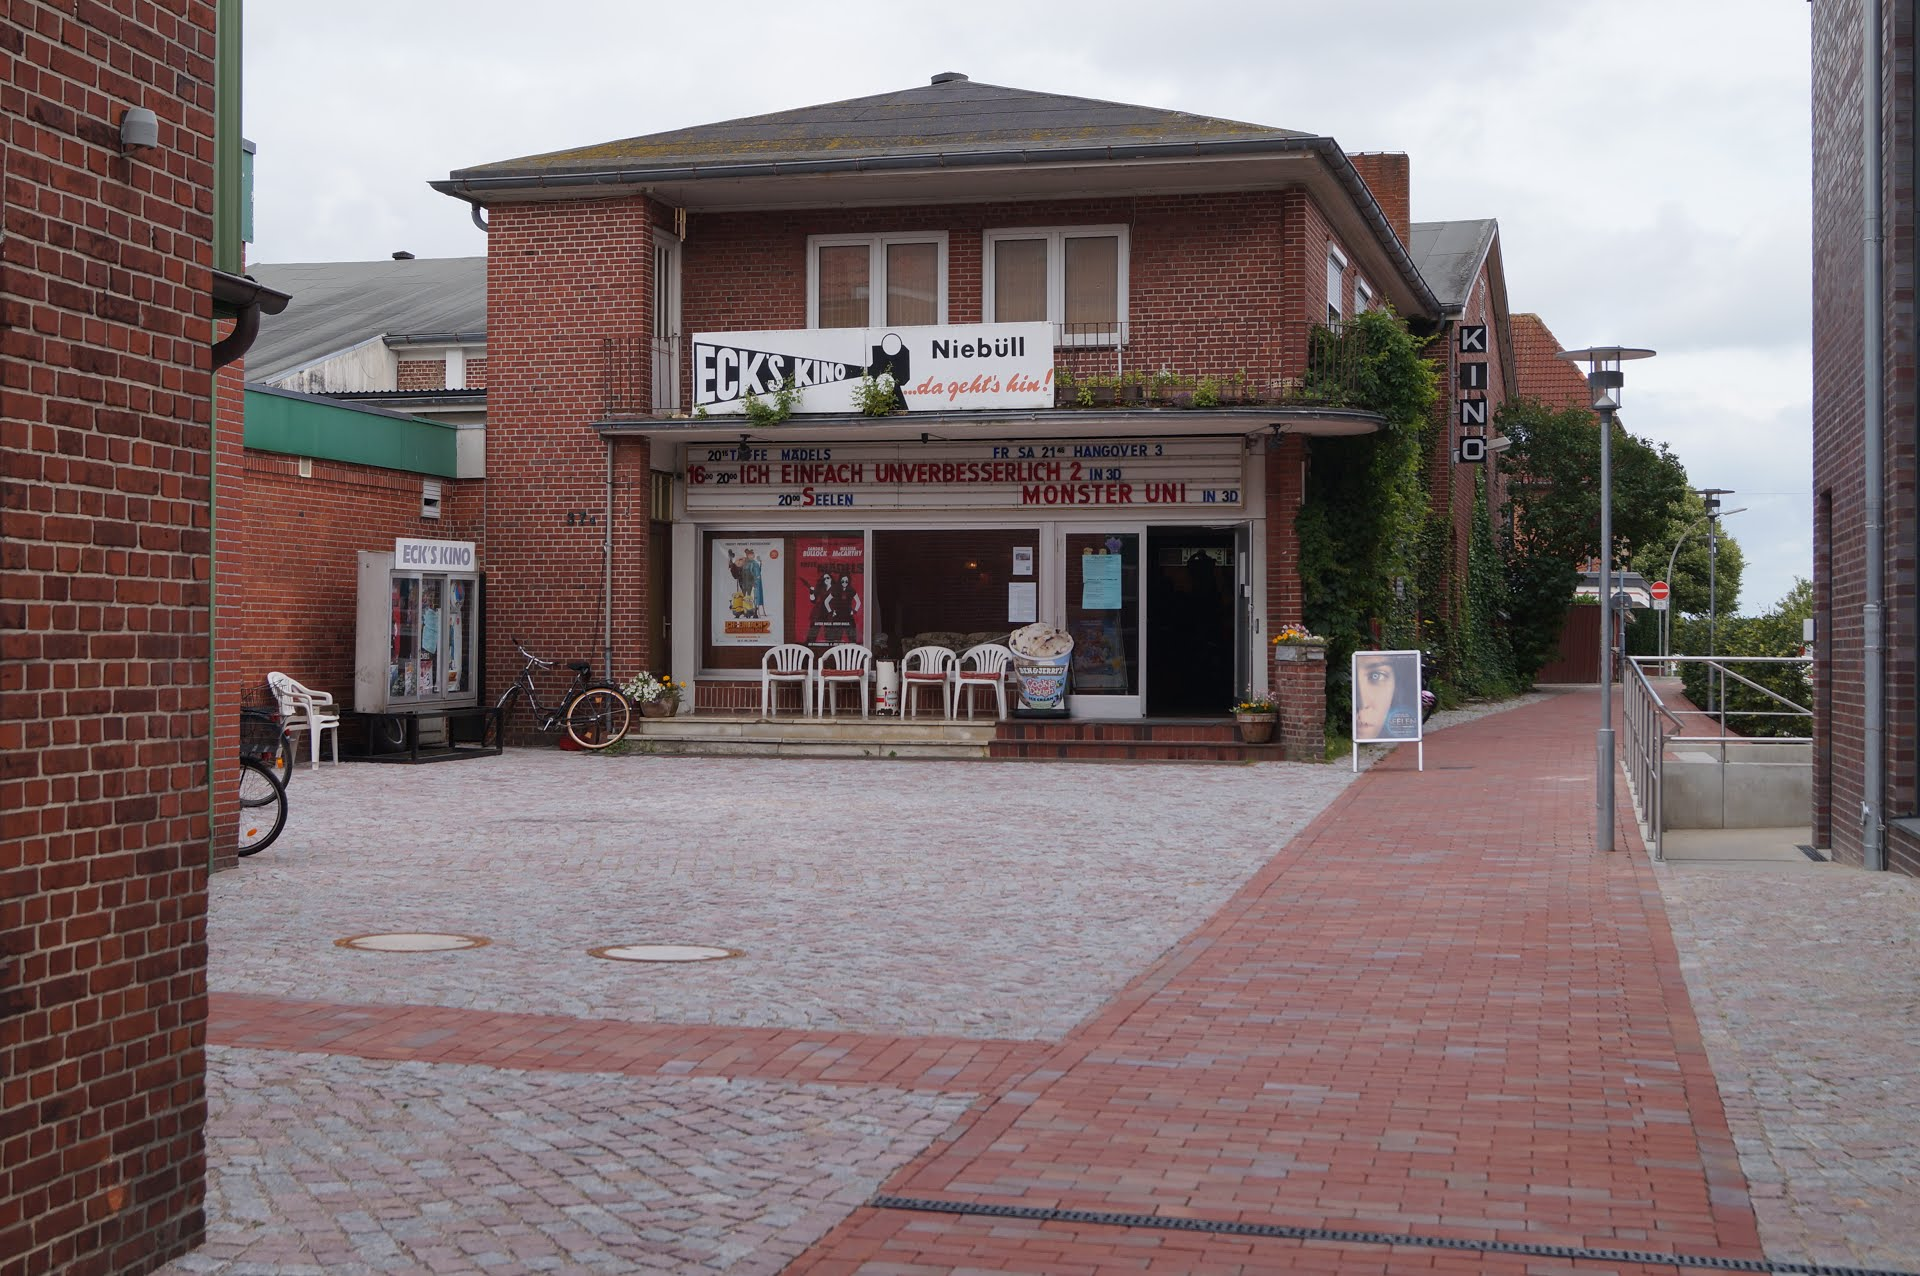 Eck's Kino Niebüll